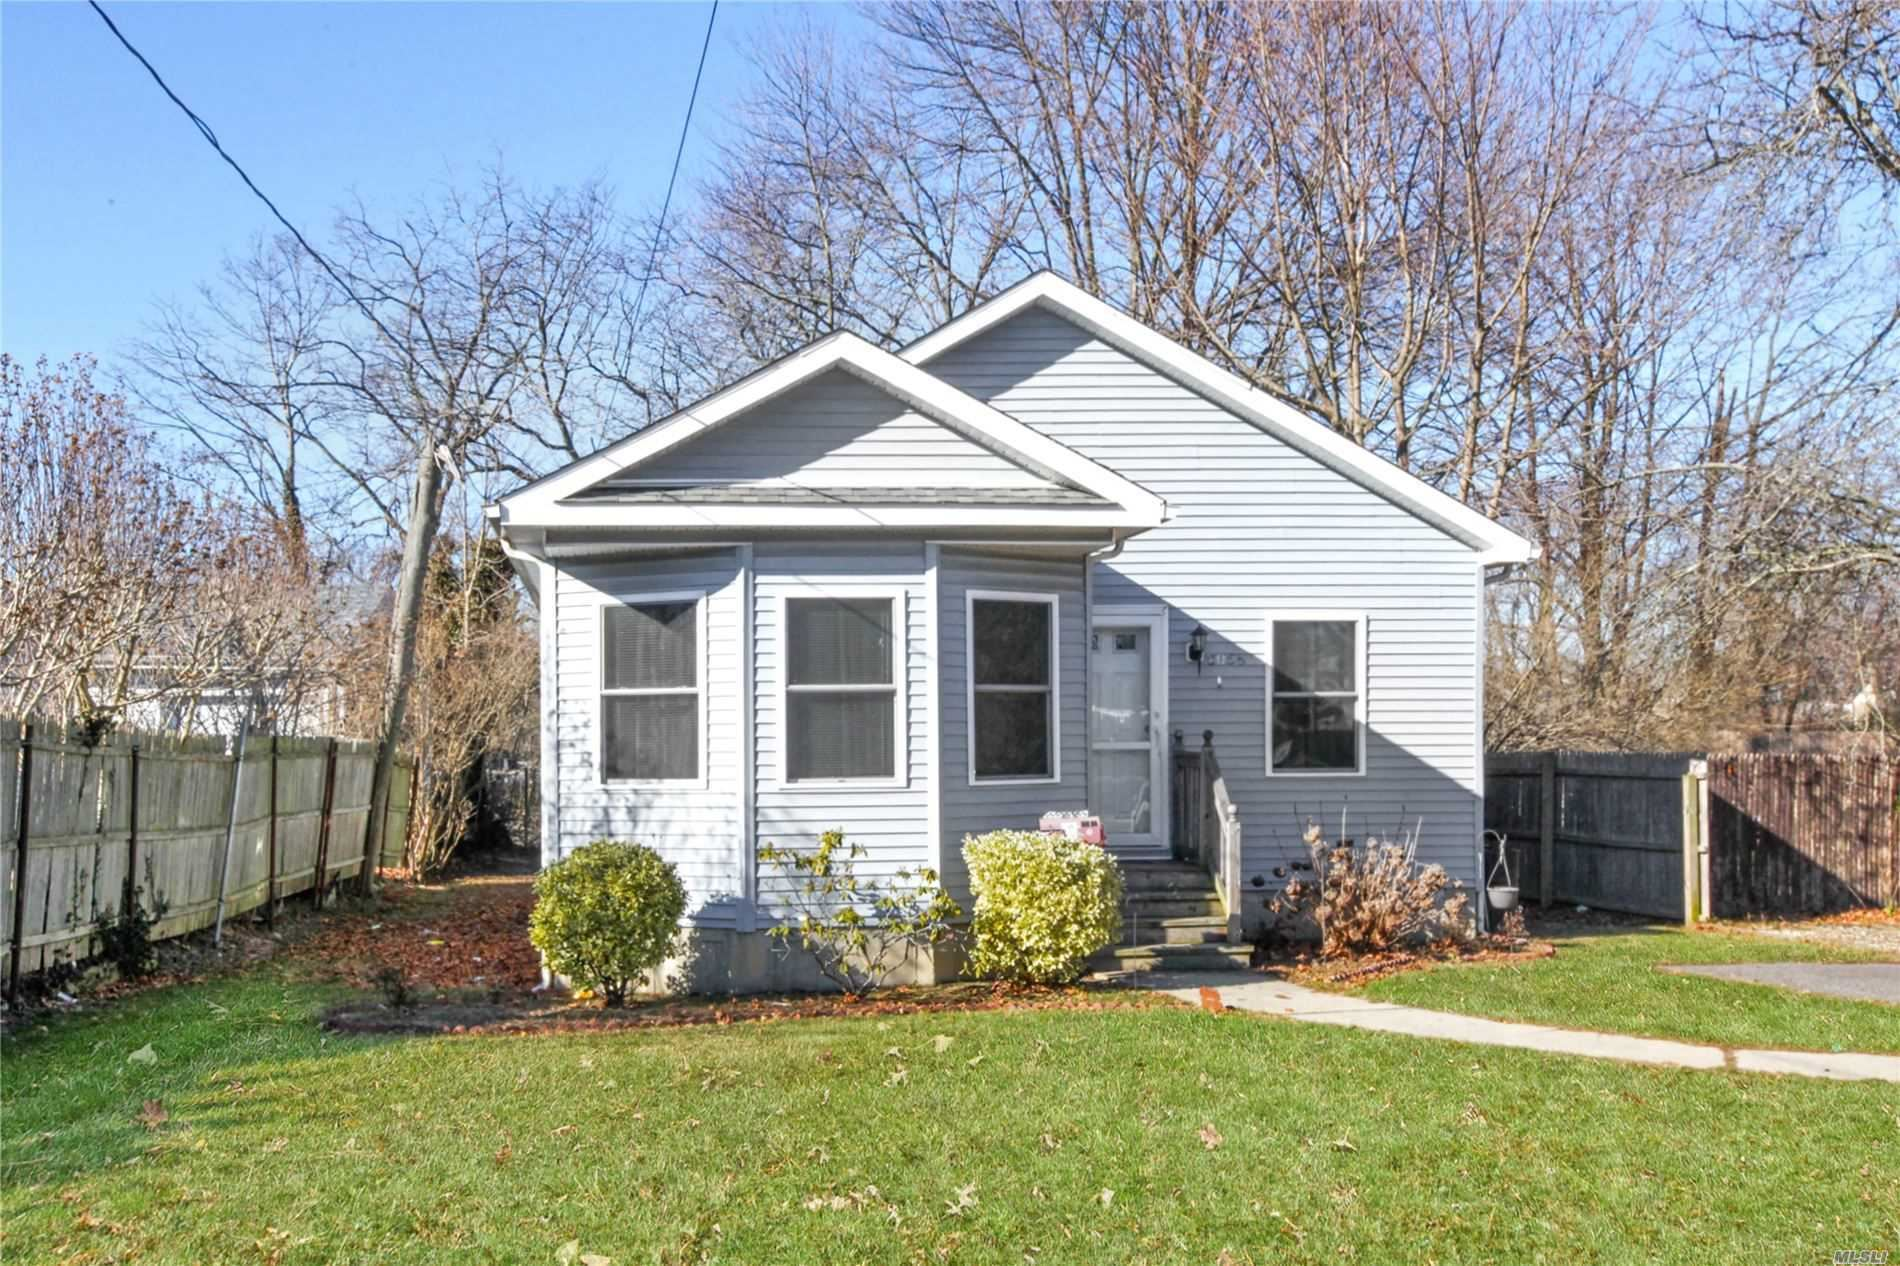 2056 Seamans Neck Road, Seaford, NY 11783 - MLS#: 3201433